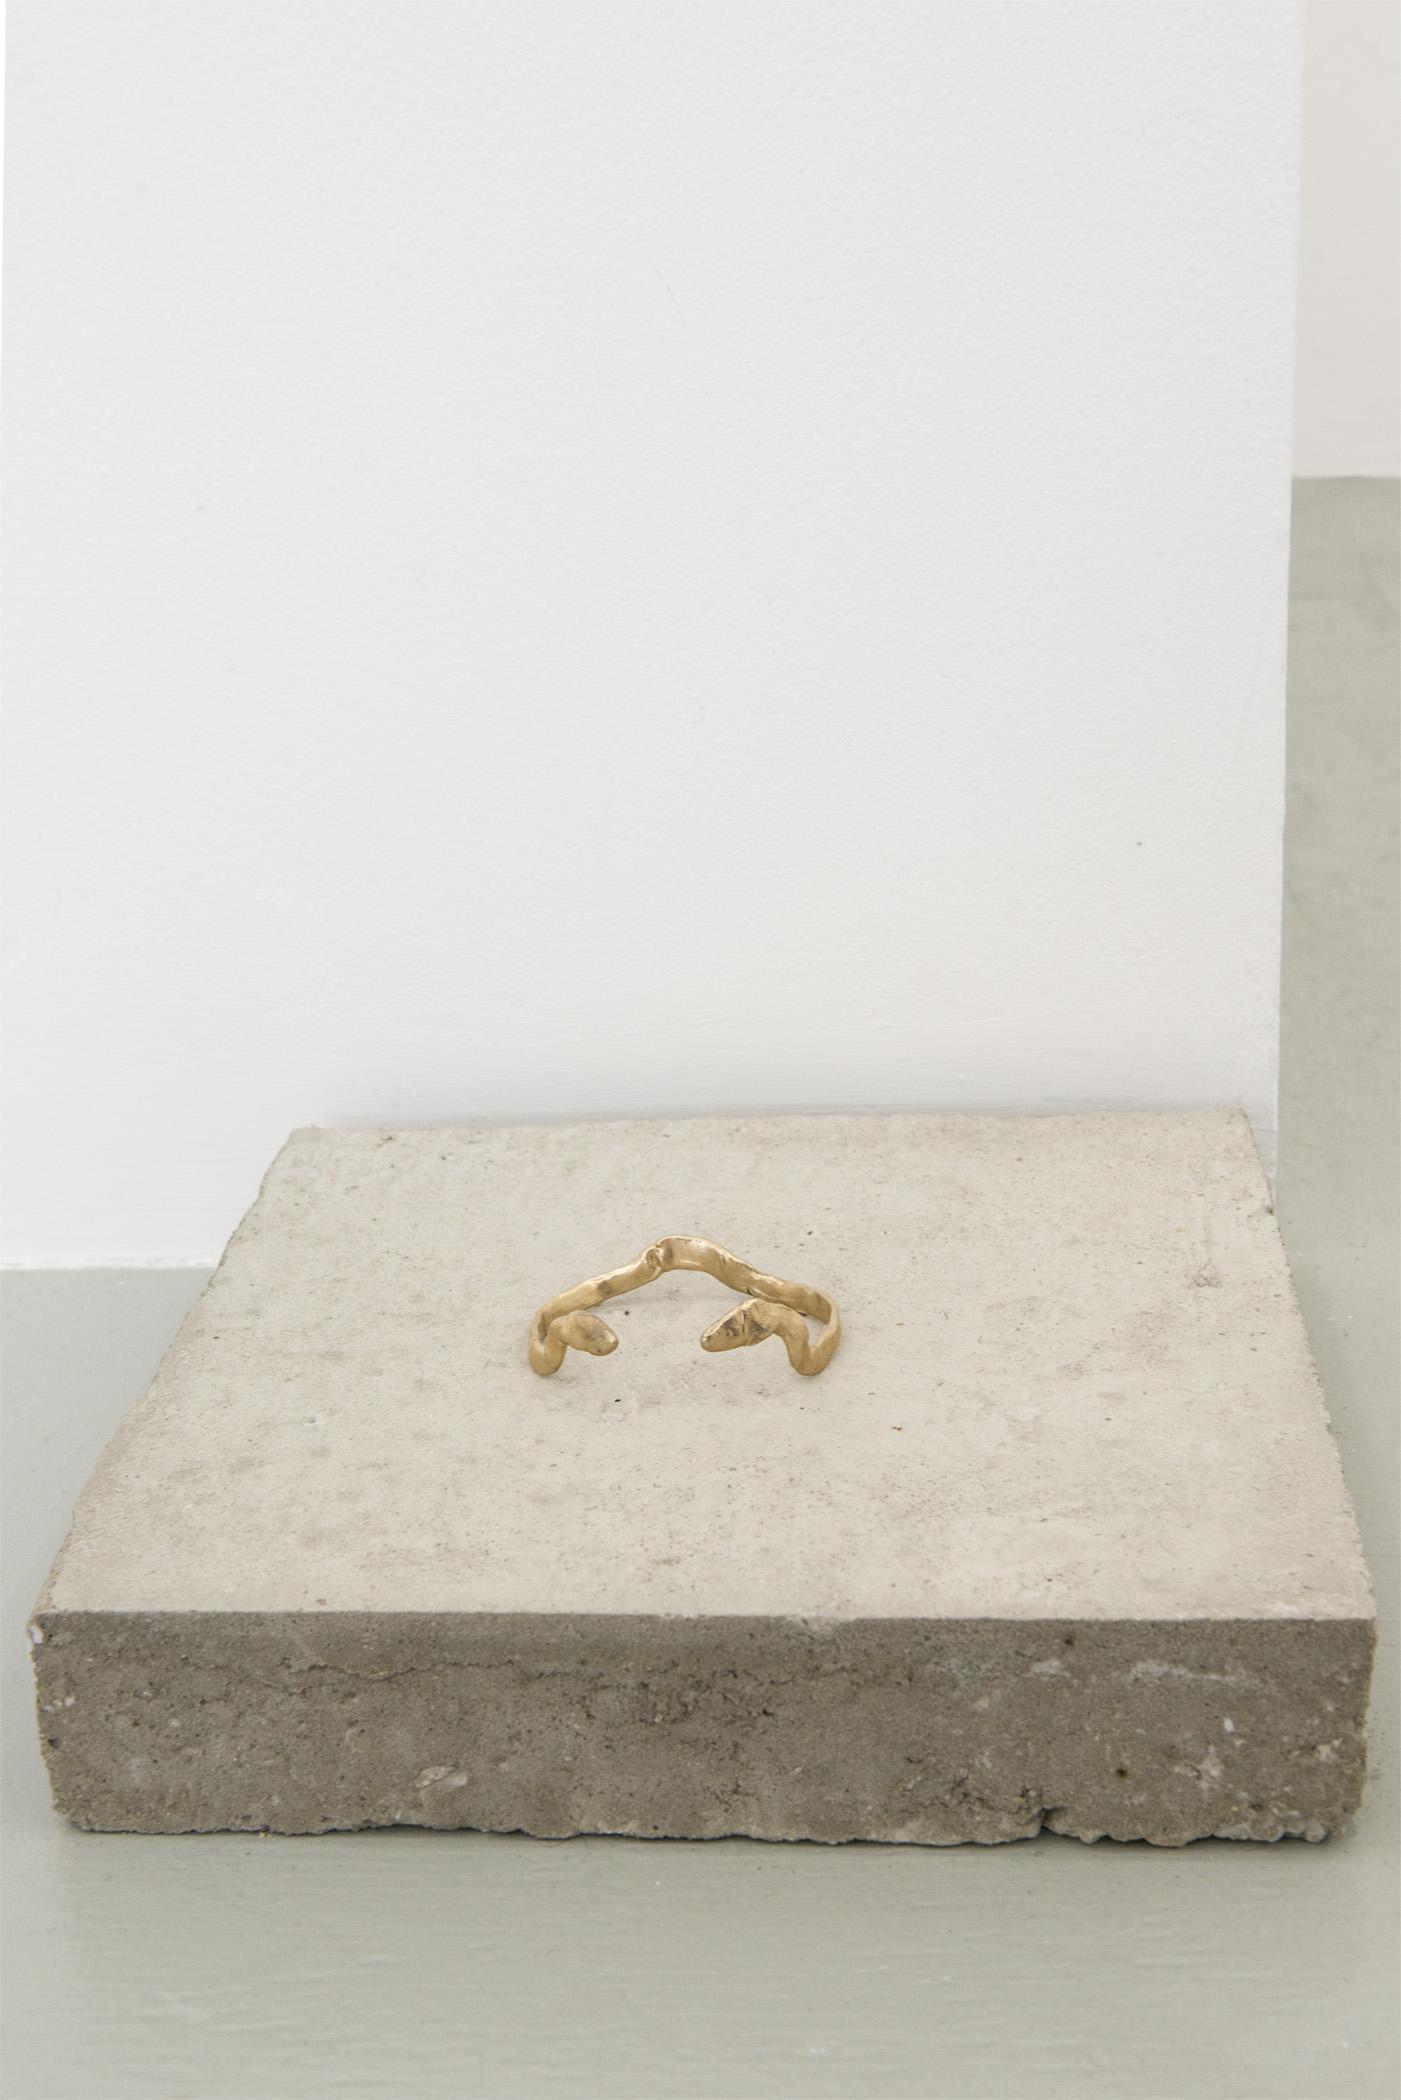 Aidan Koch VII, Queen of Egypt, 2015 Cast bronze bracelet on cement block